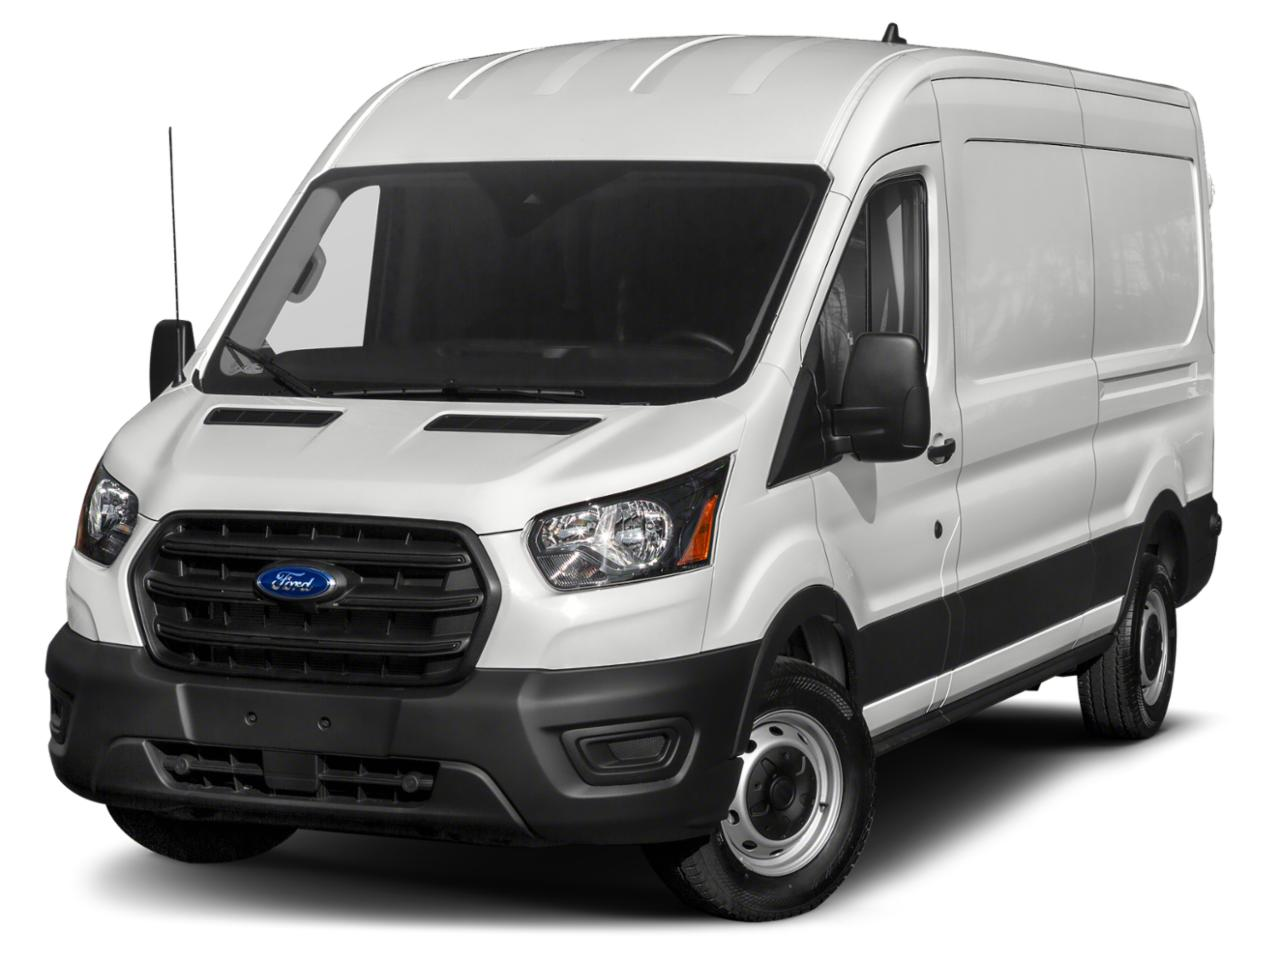 2021 Ford Transit Cargo Van Vehicle Photo in Neenah, WI 54956-3151